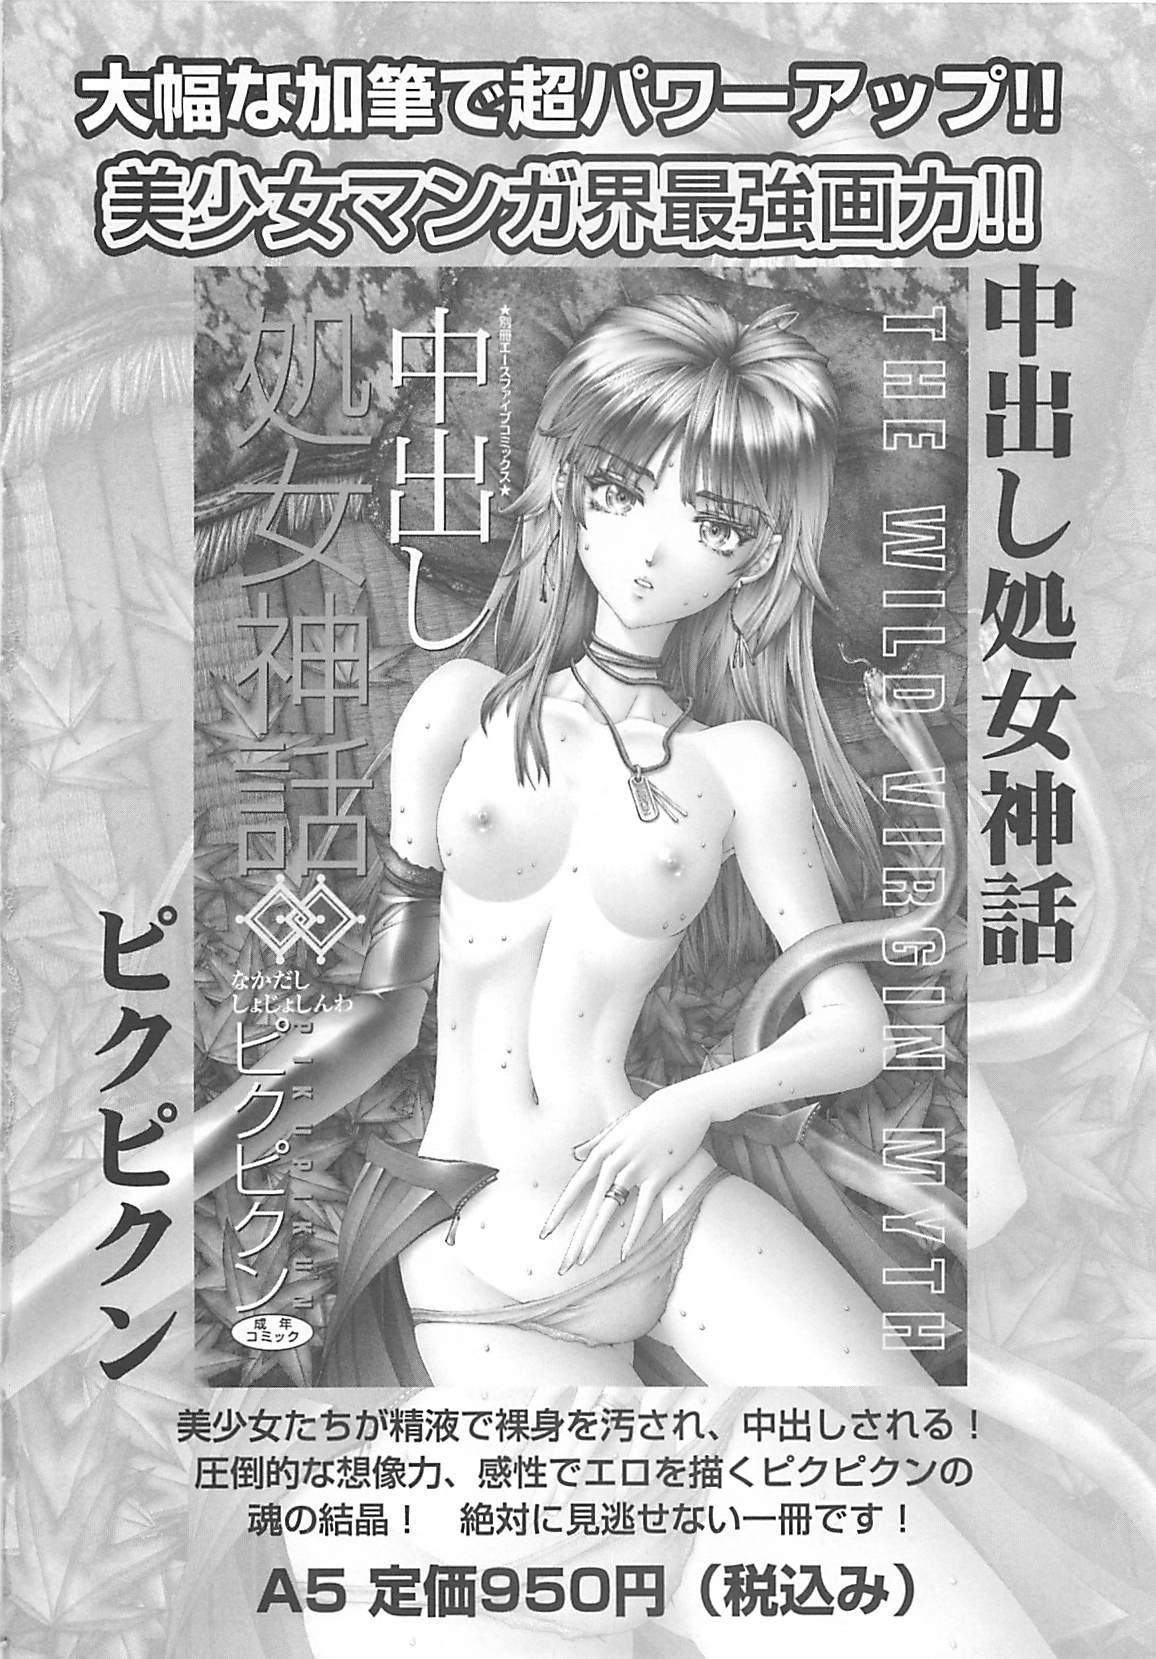 Kanin Kyoushitsu - Adultery Classroom 150